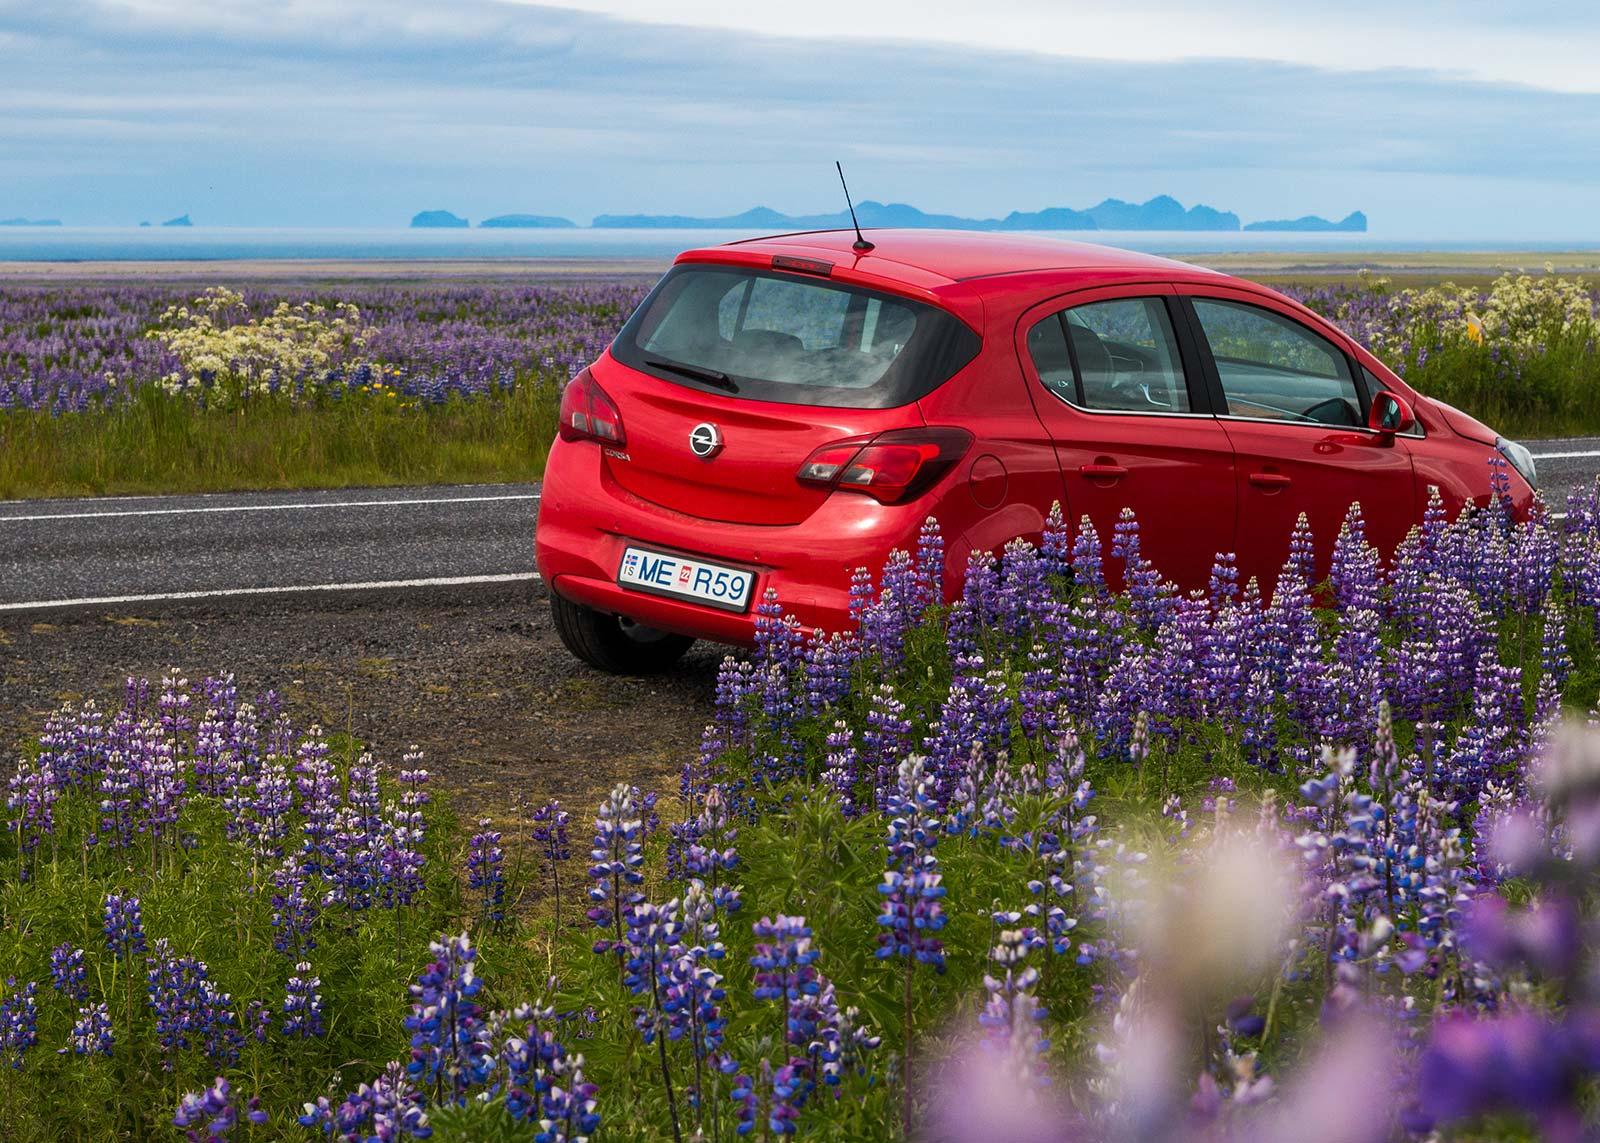 Compact Opel car rental